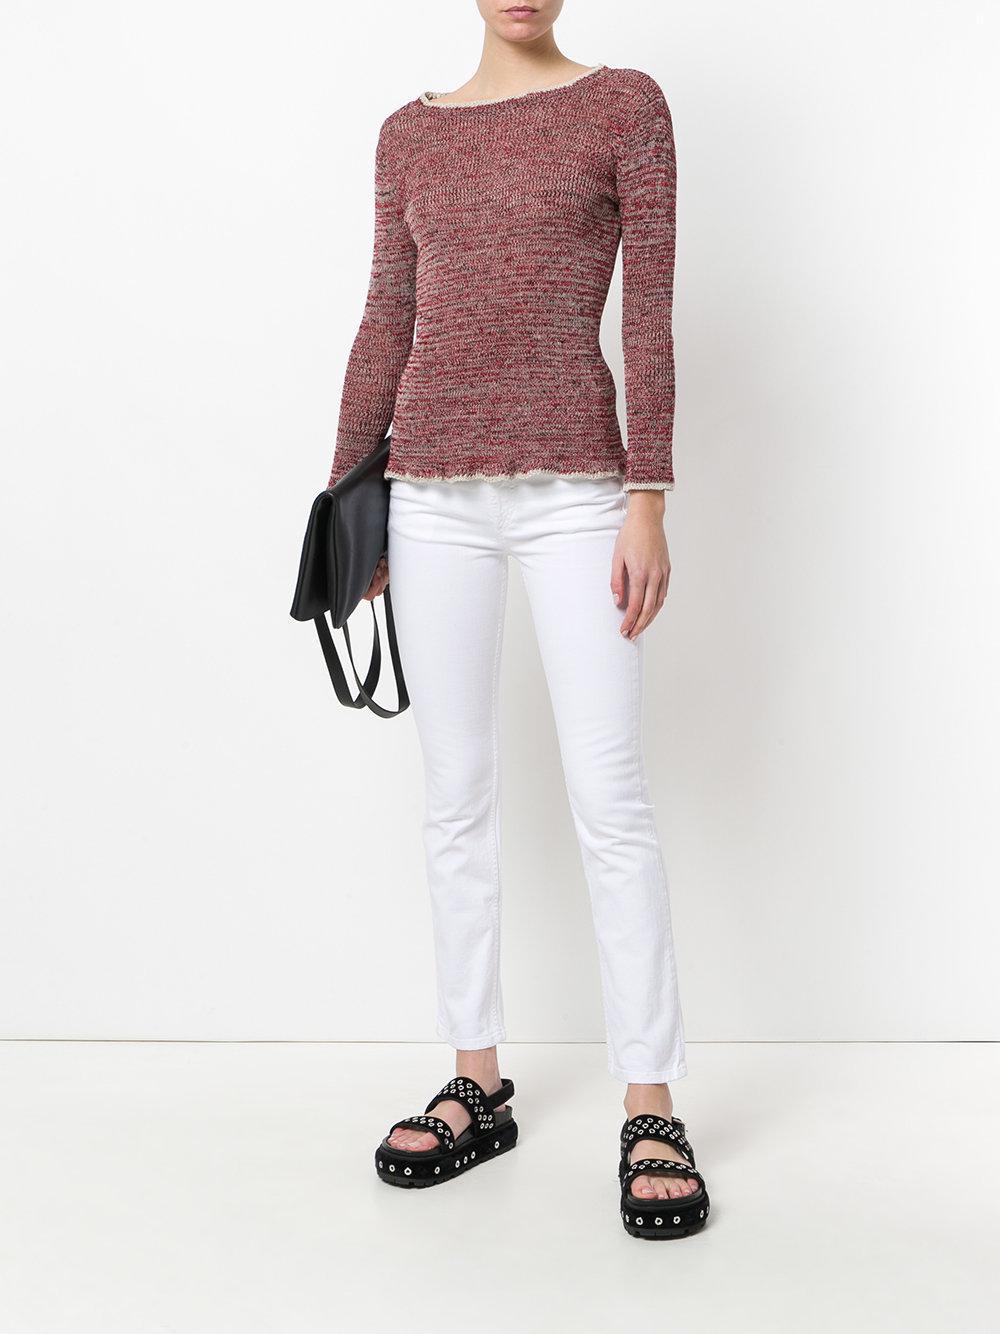 Étoile Isabel Marant Denim Slim Fit Jeans in White